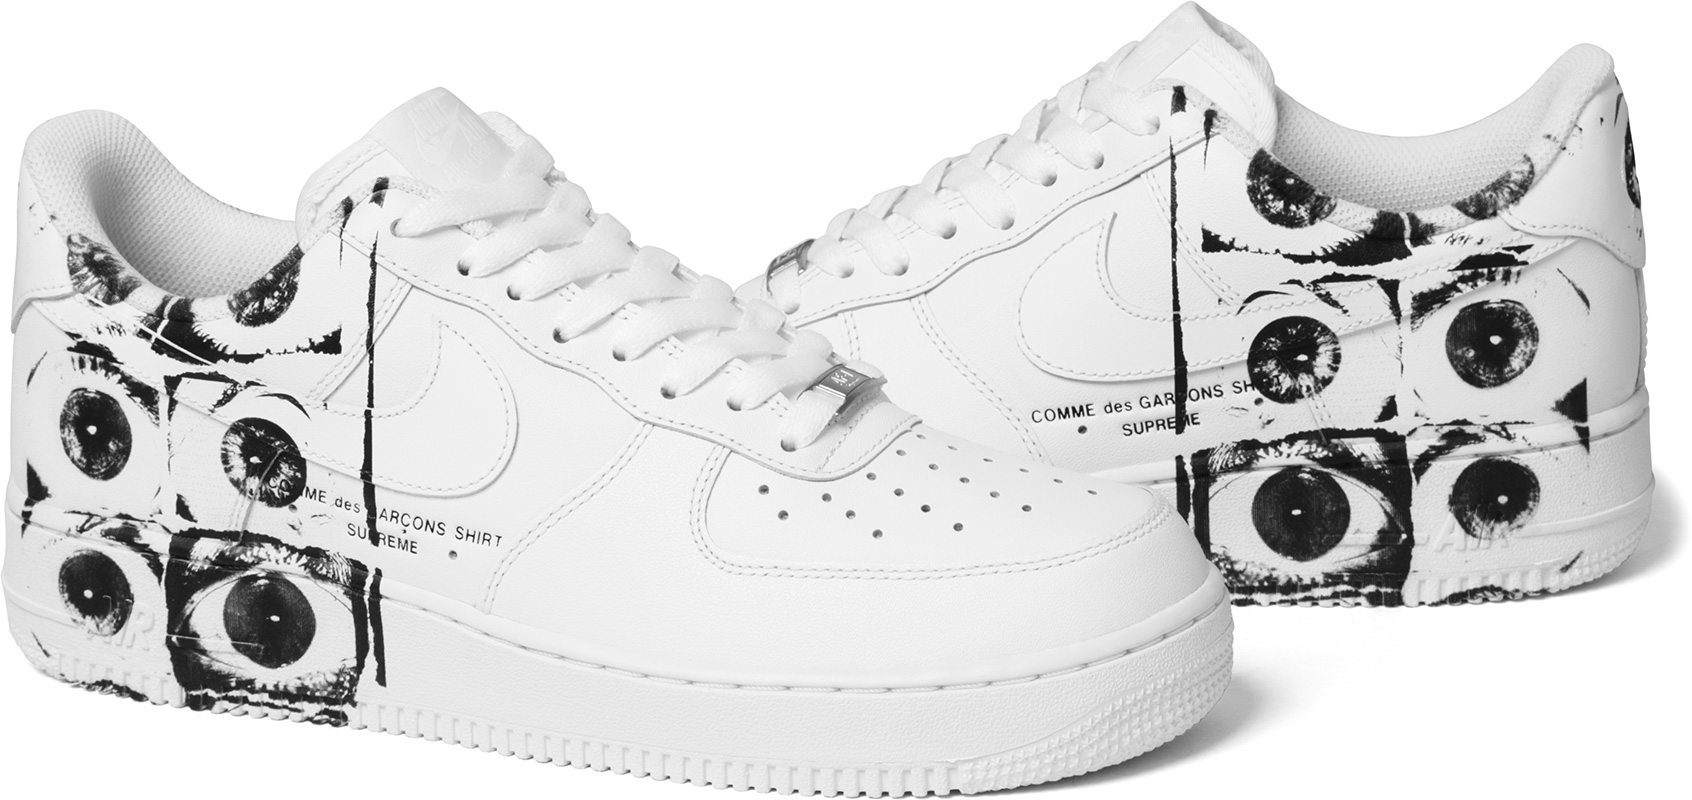 Supreme x COMME des GARÇONS SHIRT x Nike AF1 Low | HYPEBEAST